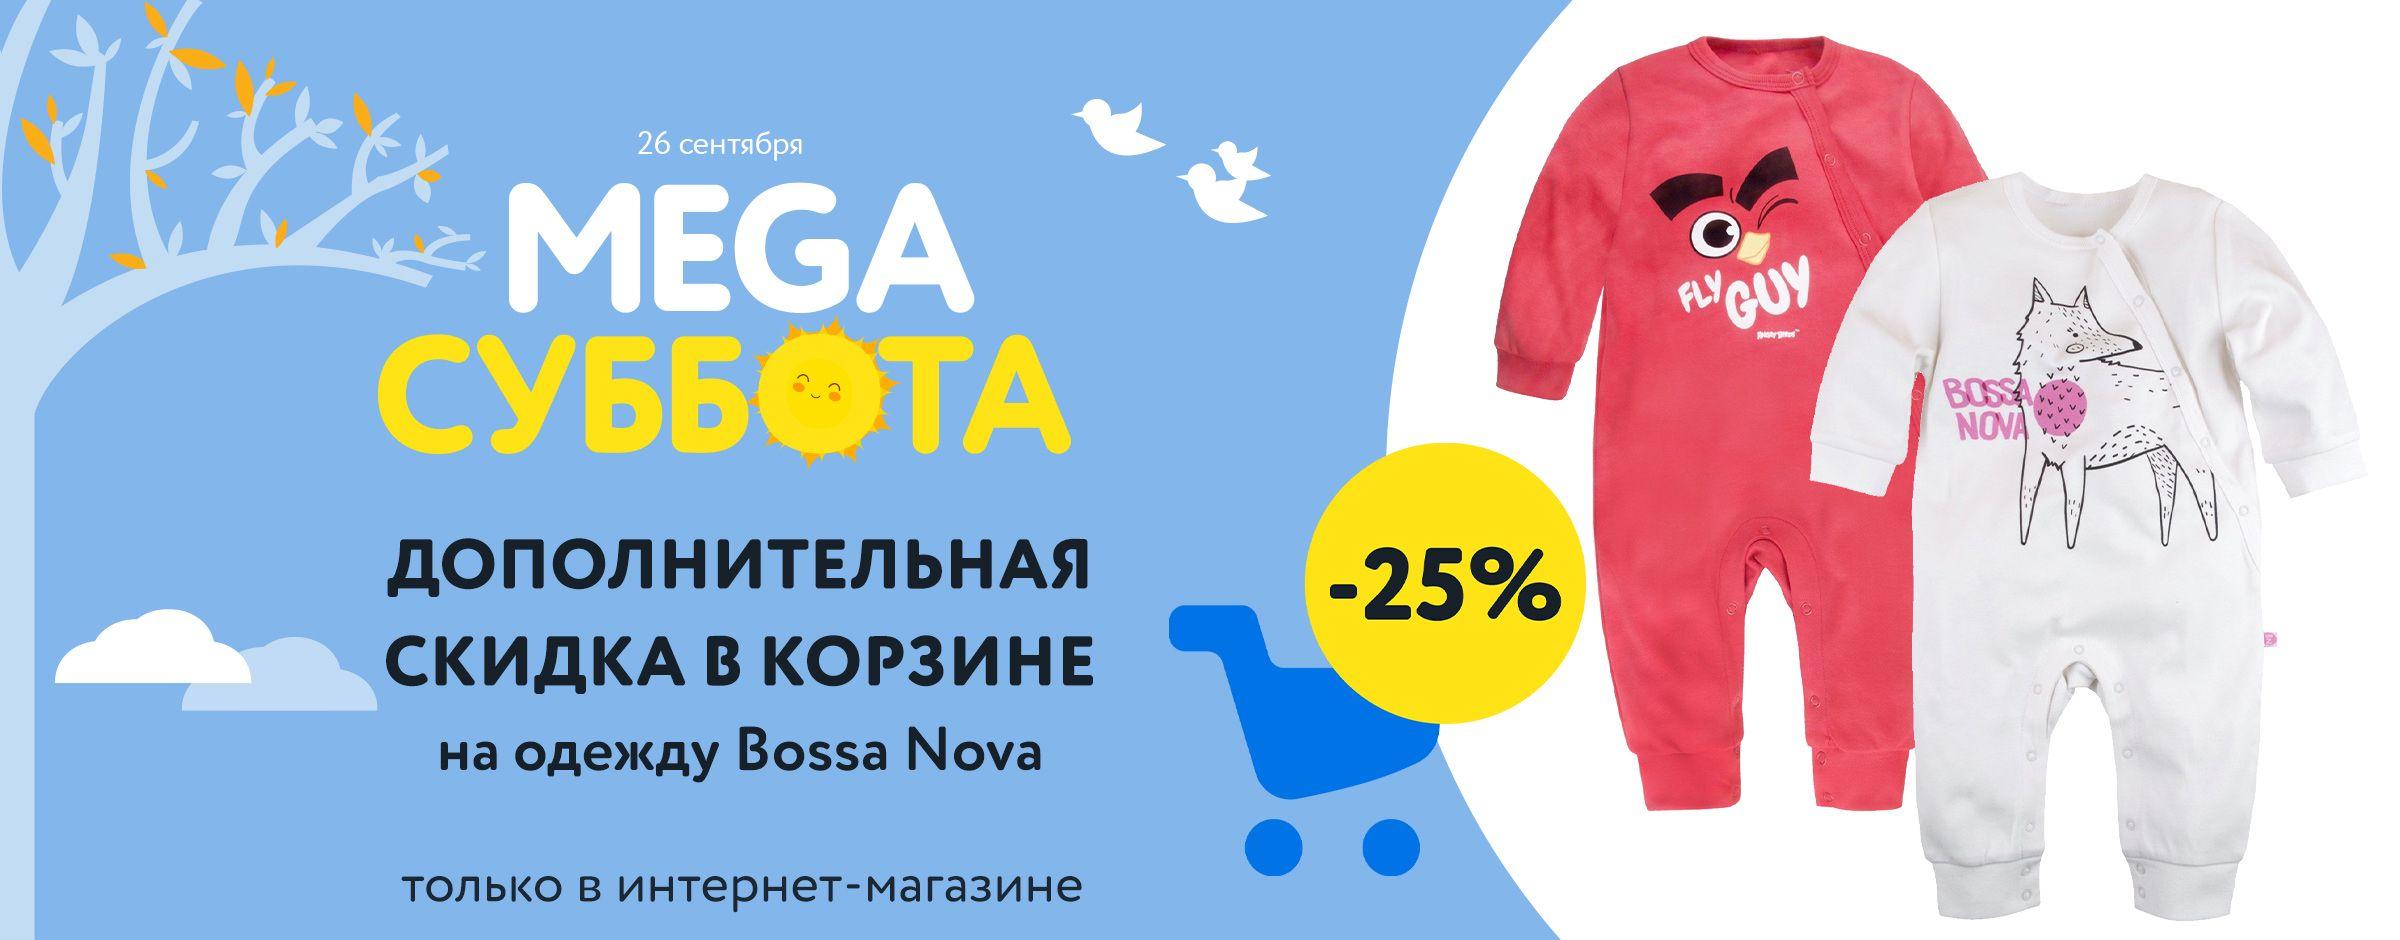 25% в корзине на одежду Bossa Nova